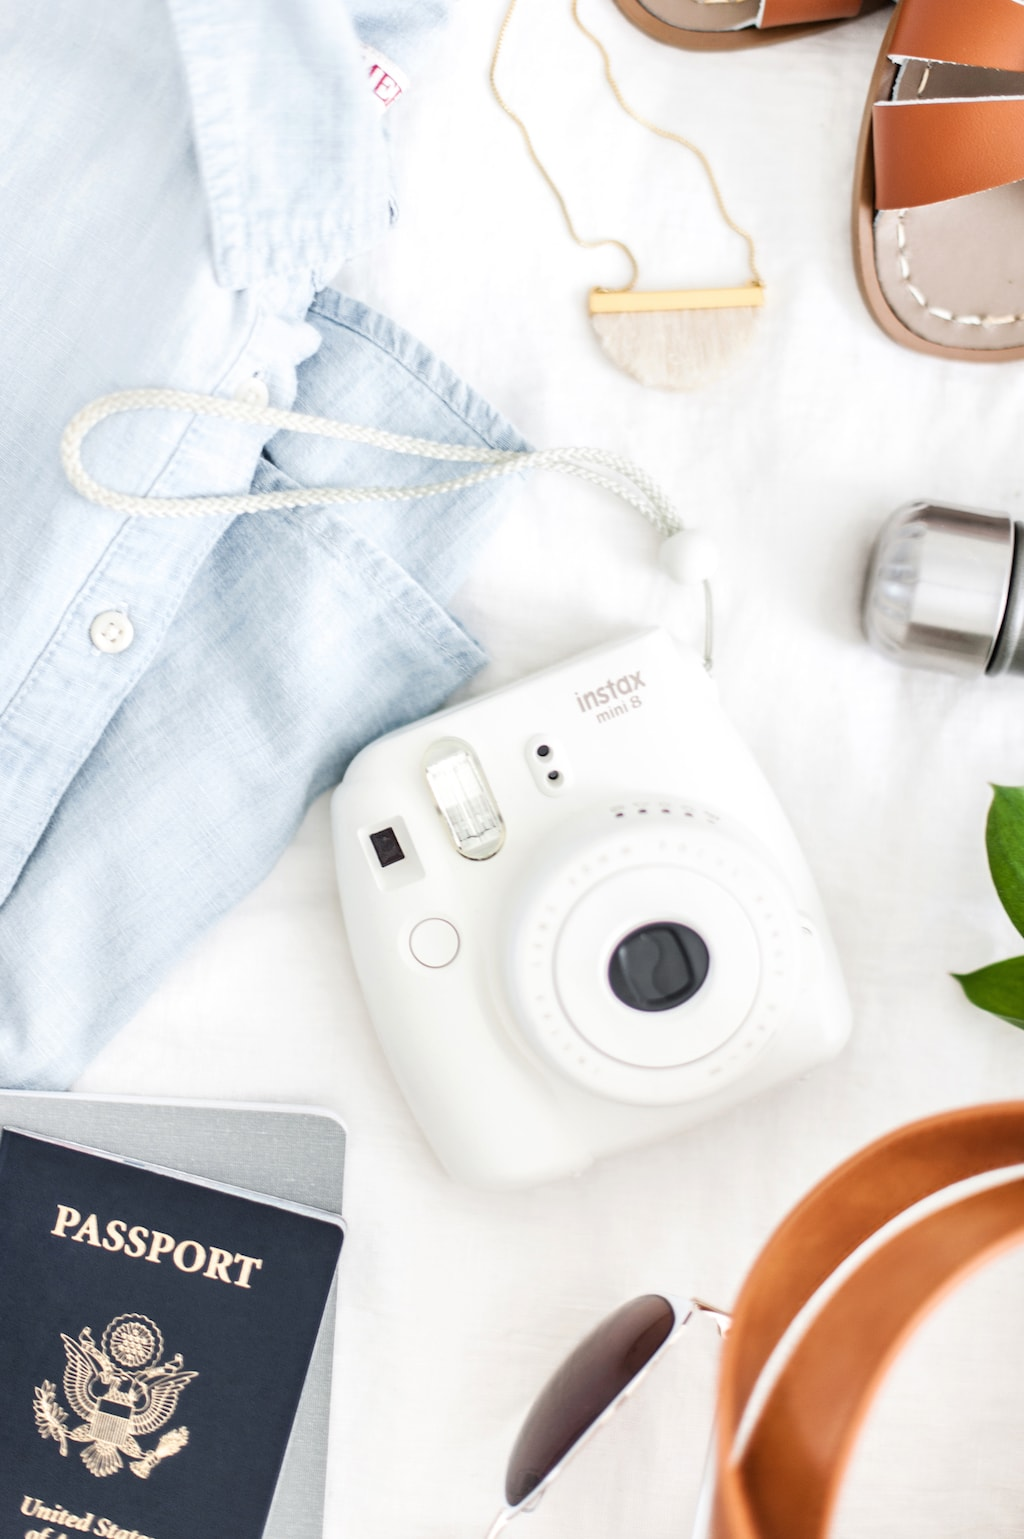 camera and clothes flatlay